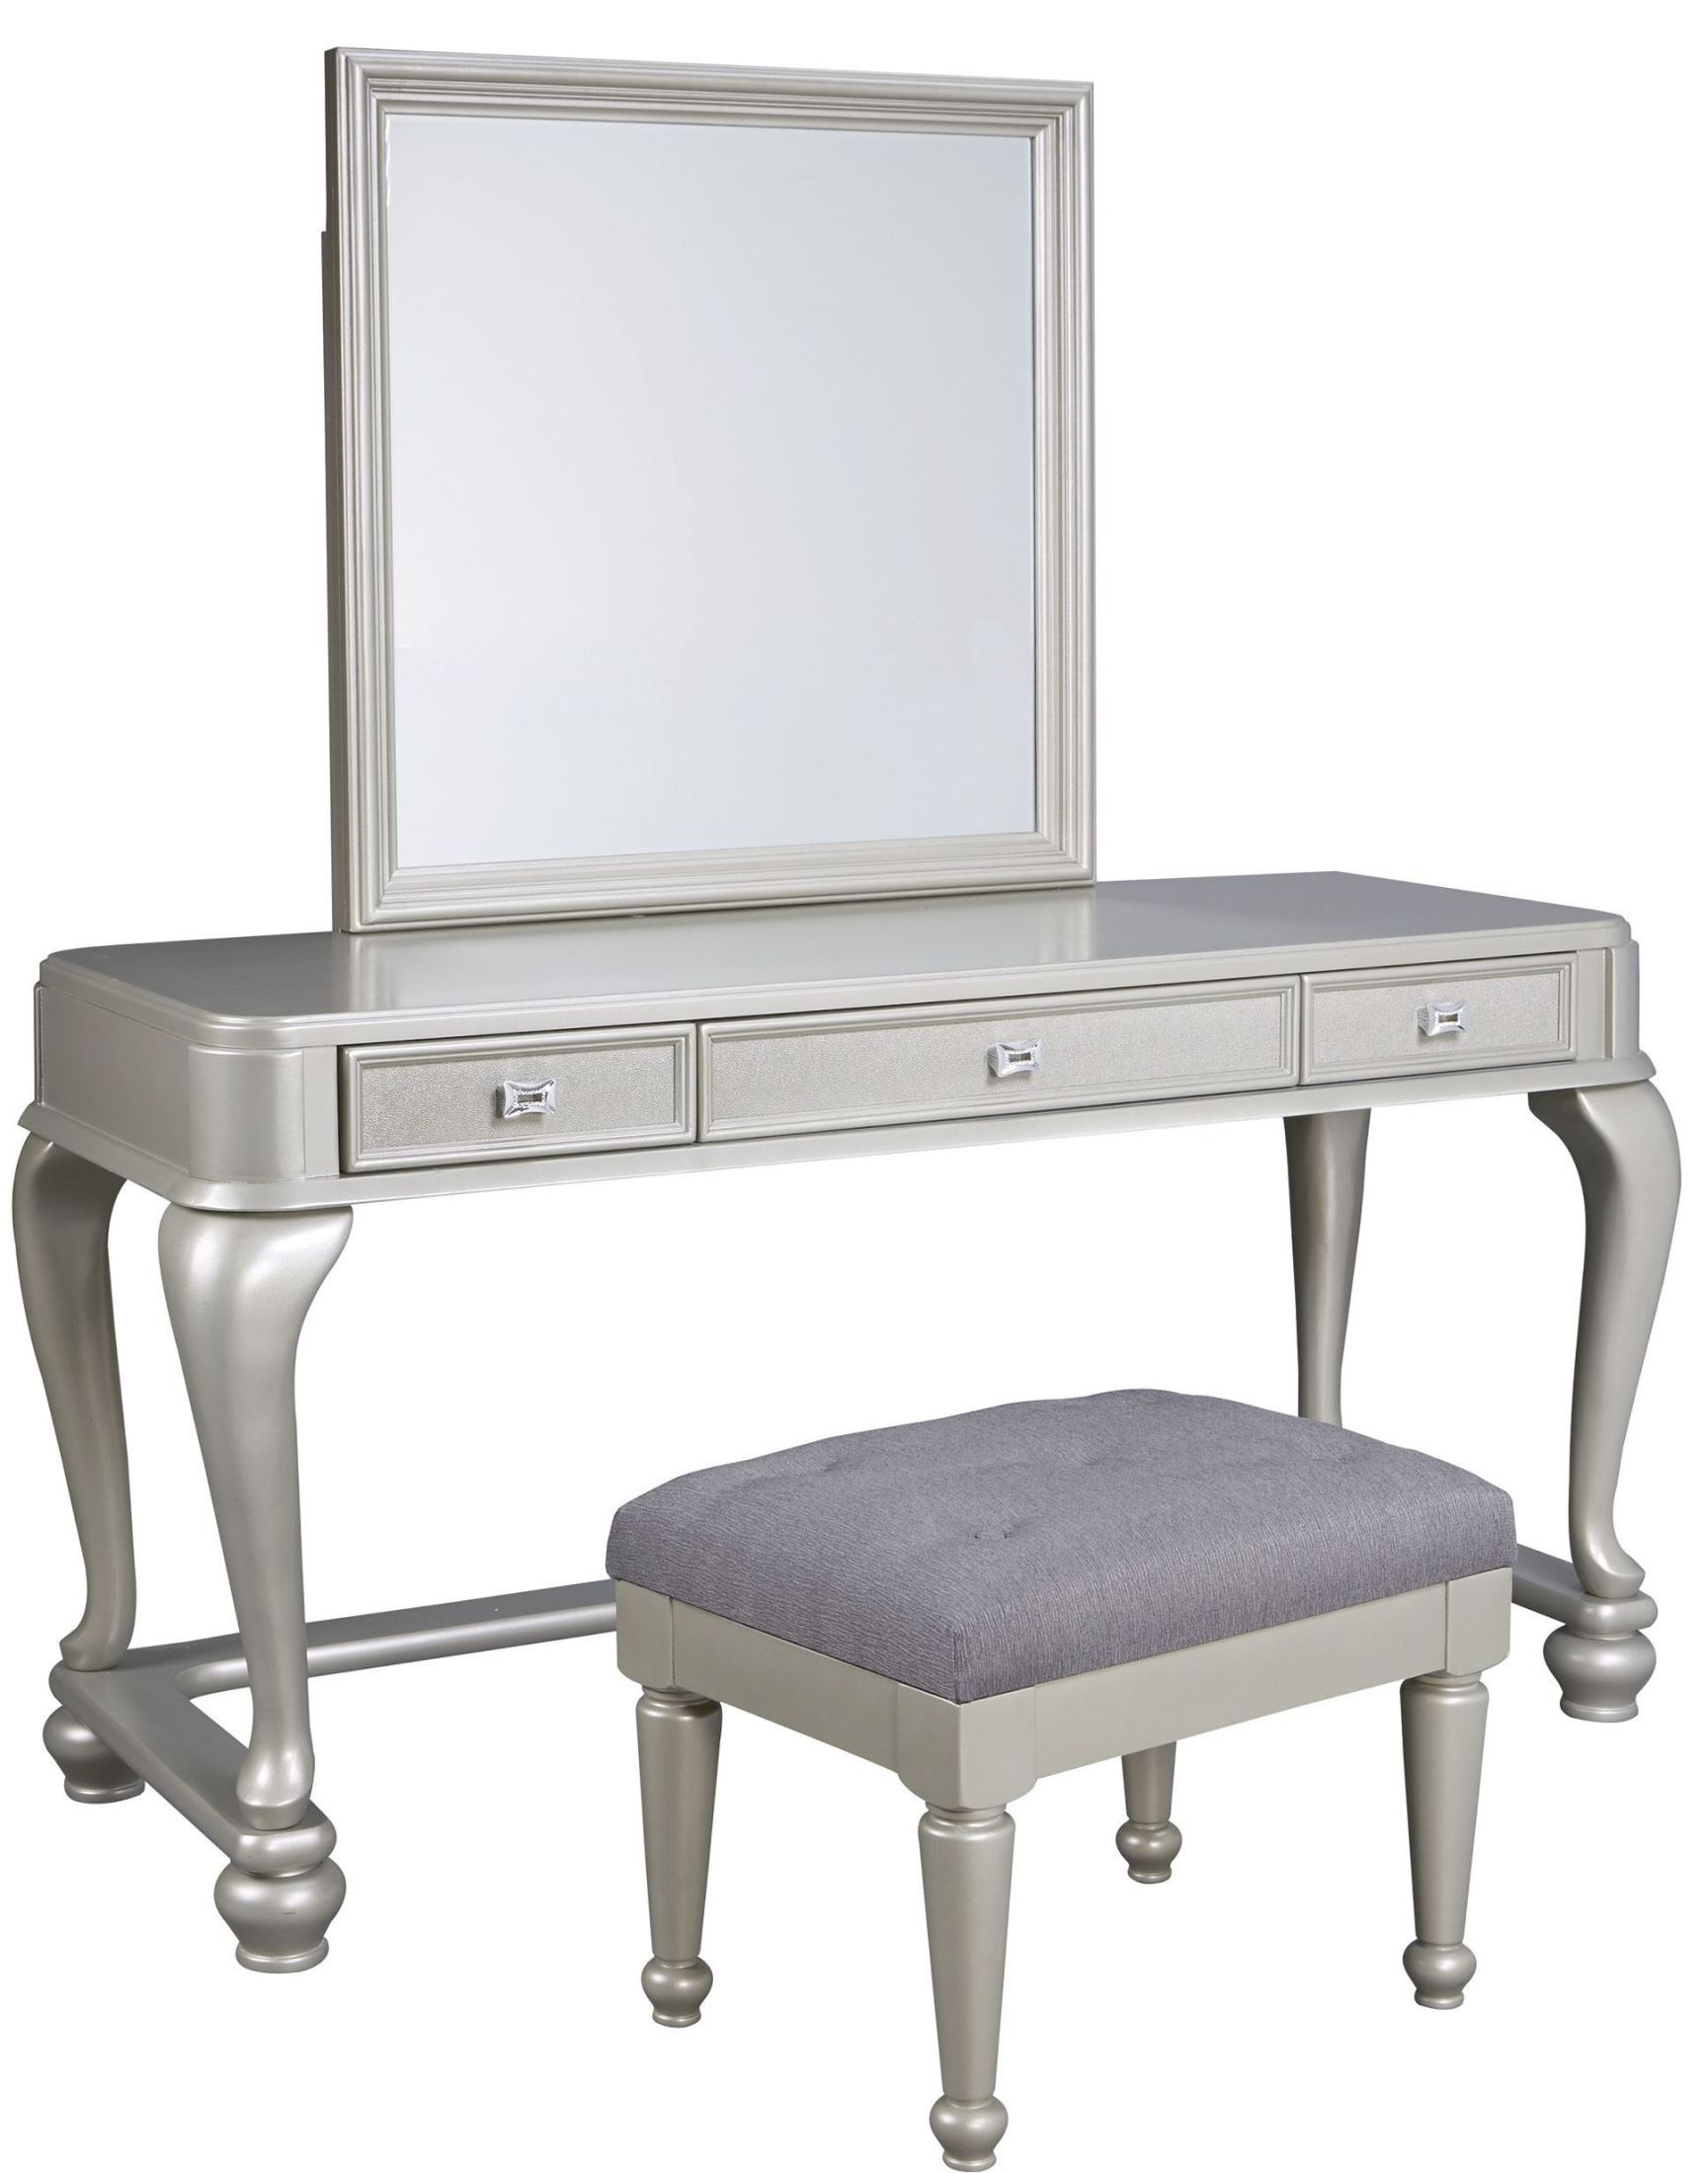 Silver Bedroom Furniture : ... Silver Bedroom Set from Ashley (B650-157-54-96)  Coleman Furniture